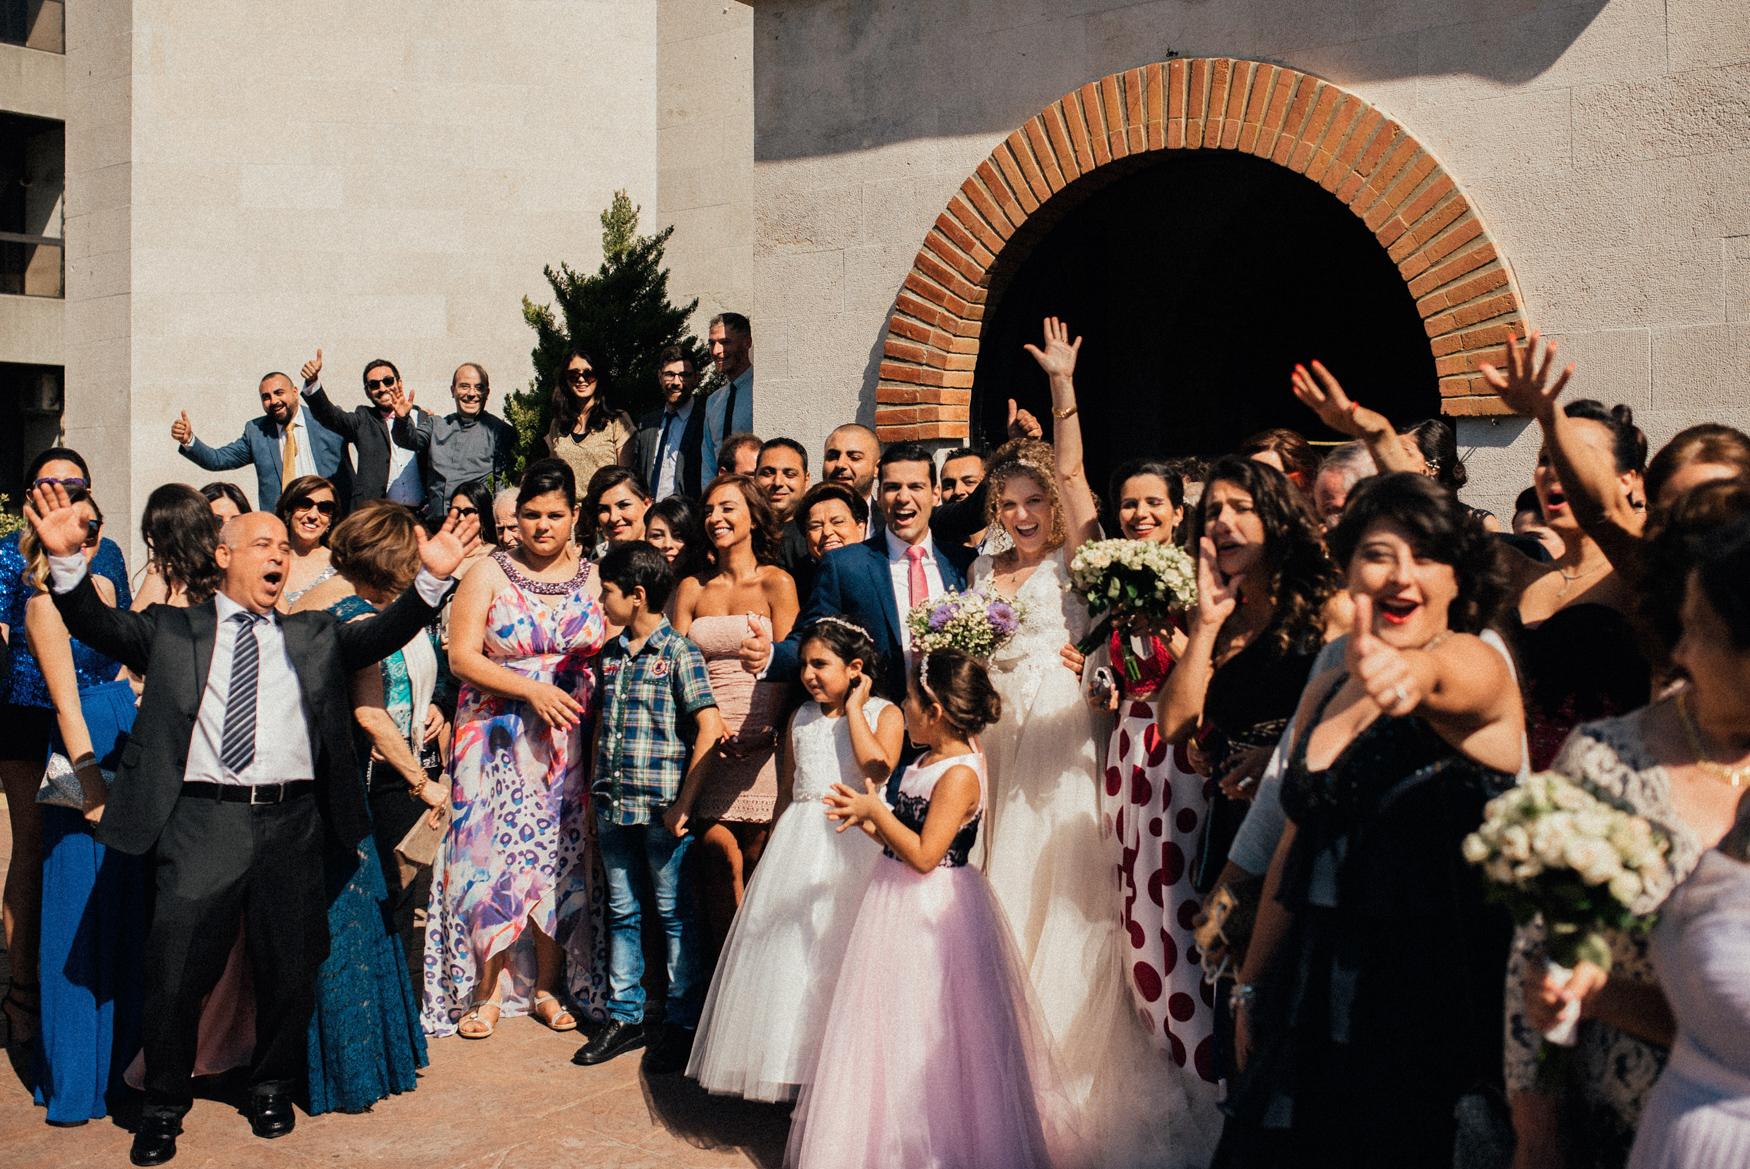 LR3 byblos beirut church wedding ceremony lebanon 016.jpg